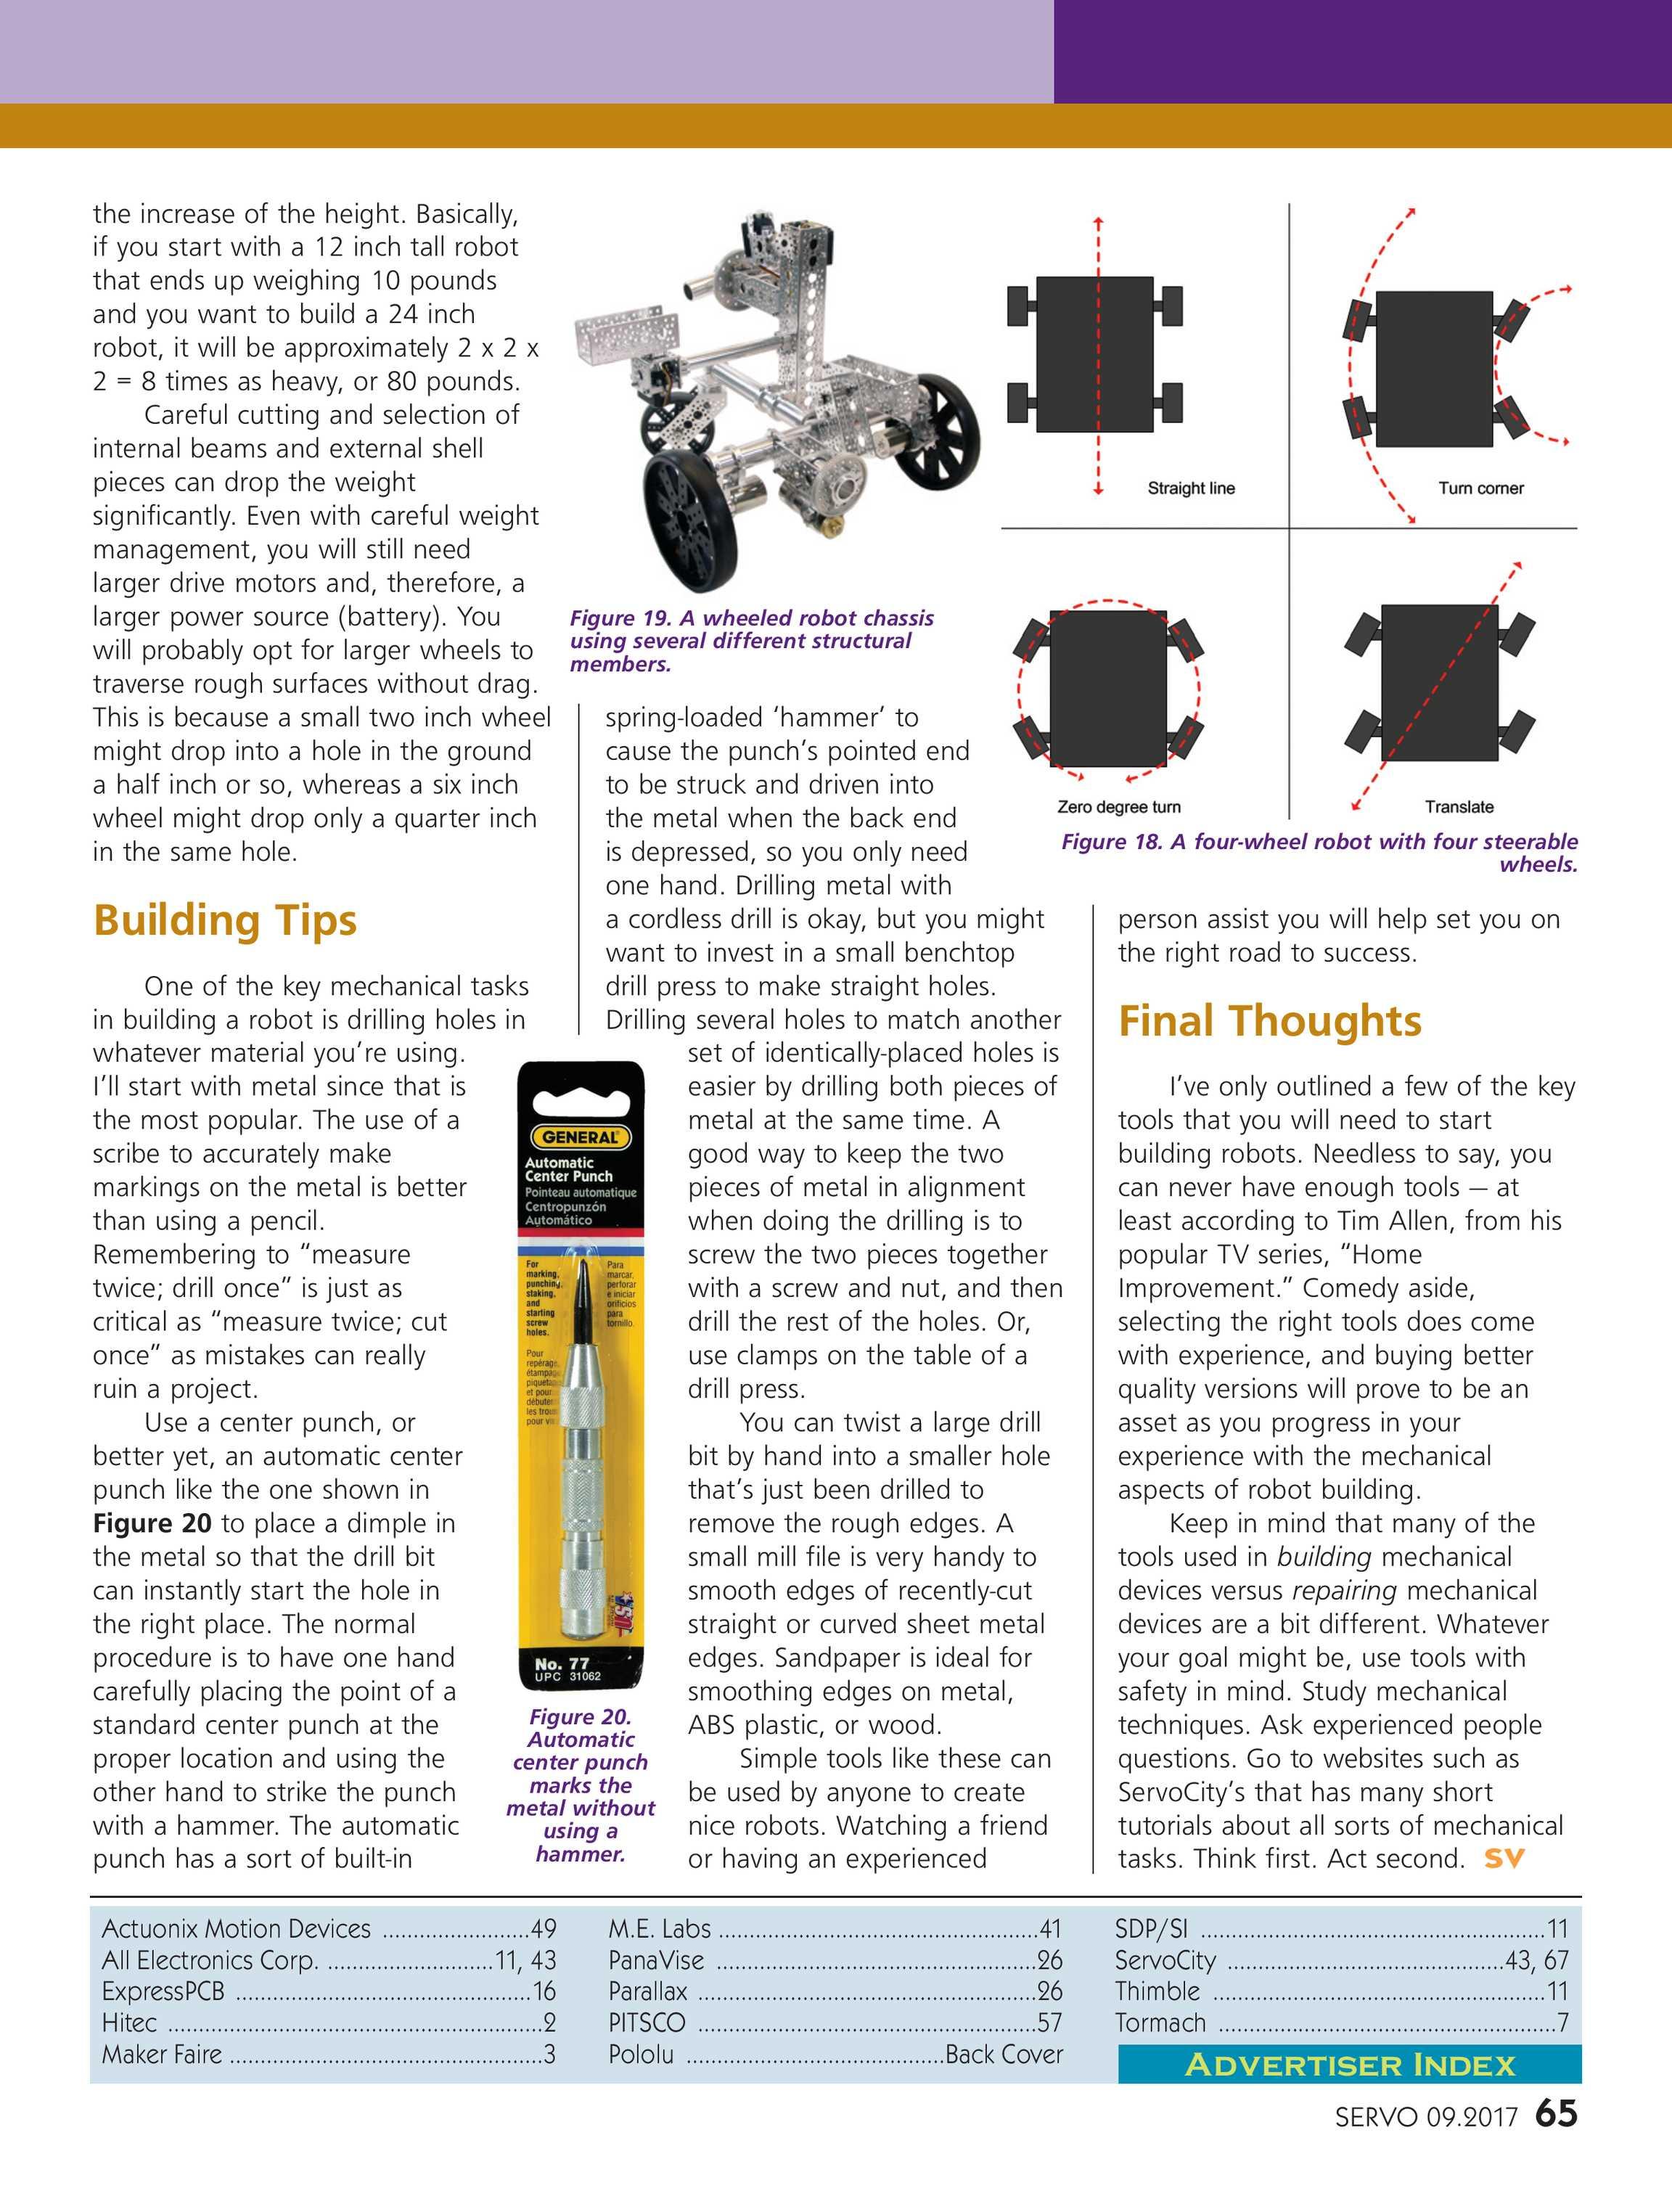 Servo - September 2017 - page 65